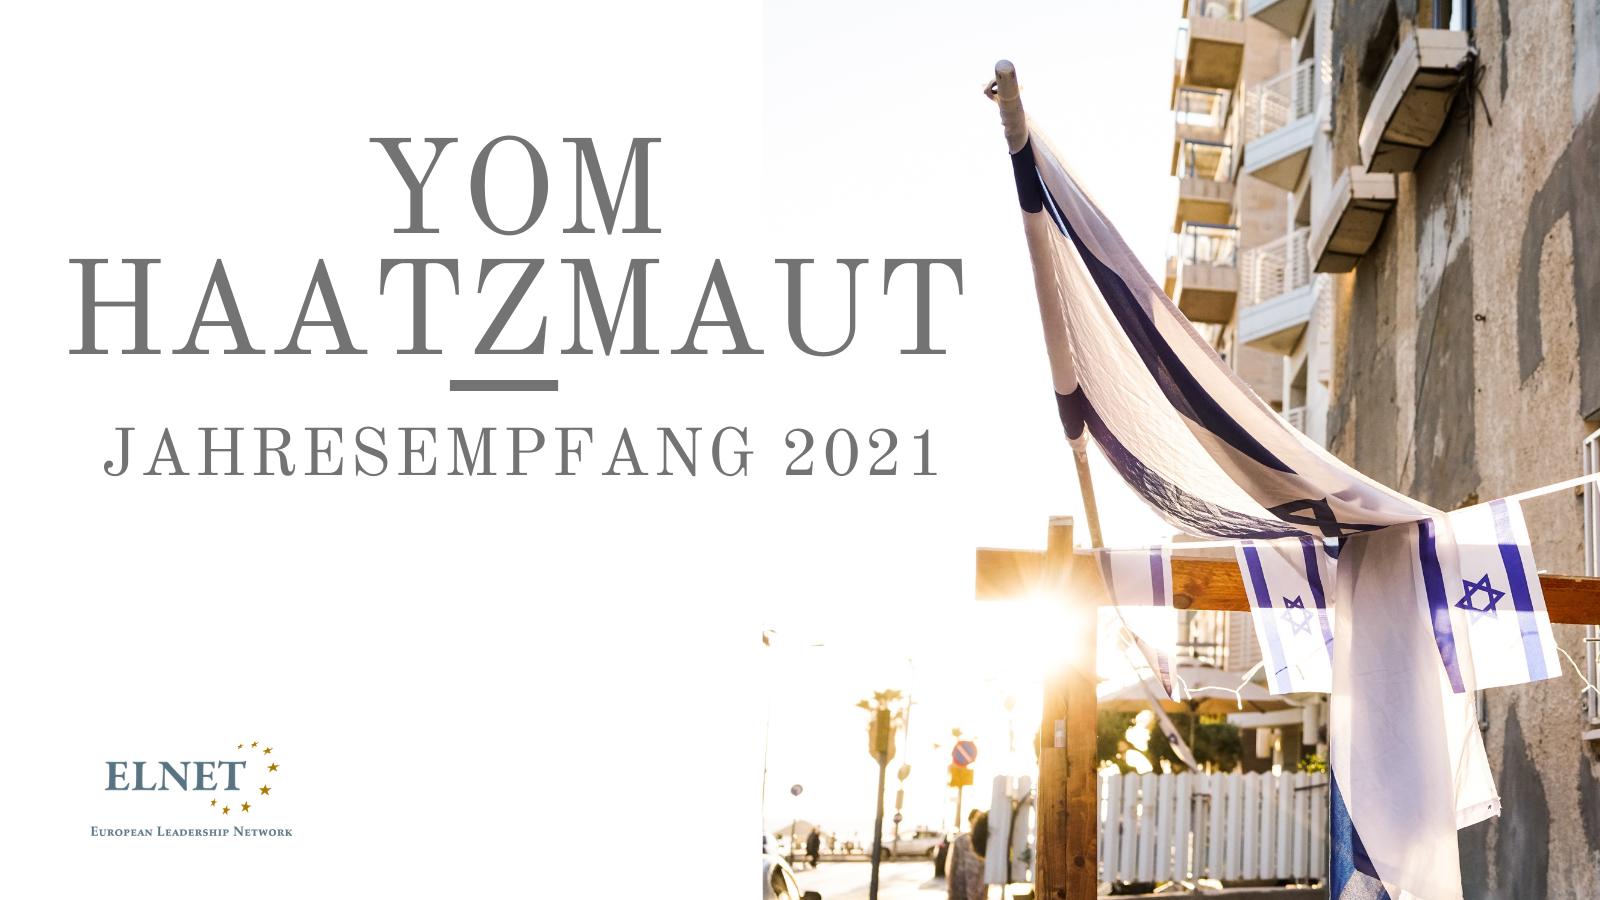 ELNET Yom Haatzmaut Empfang 2021